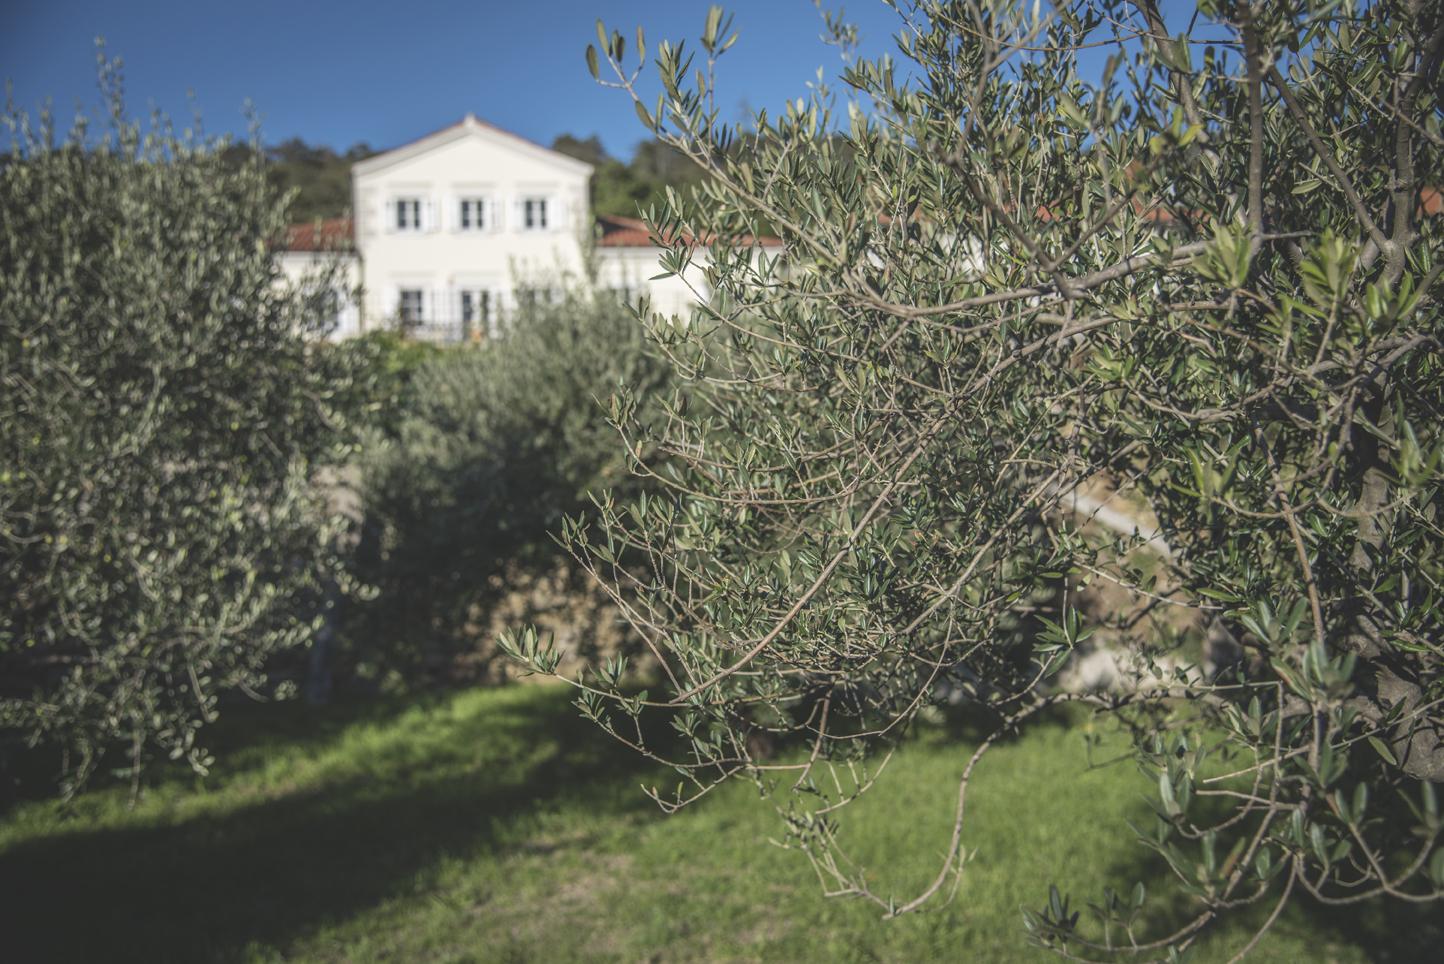 Villa_Bonomo_l'uliveto_3